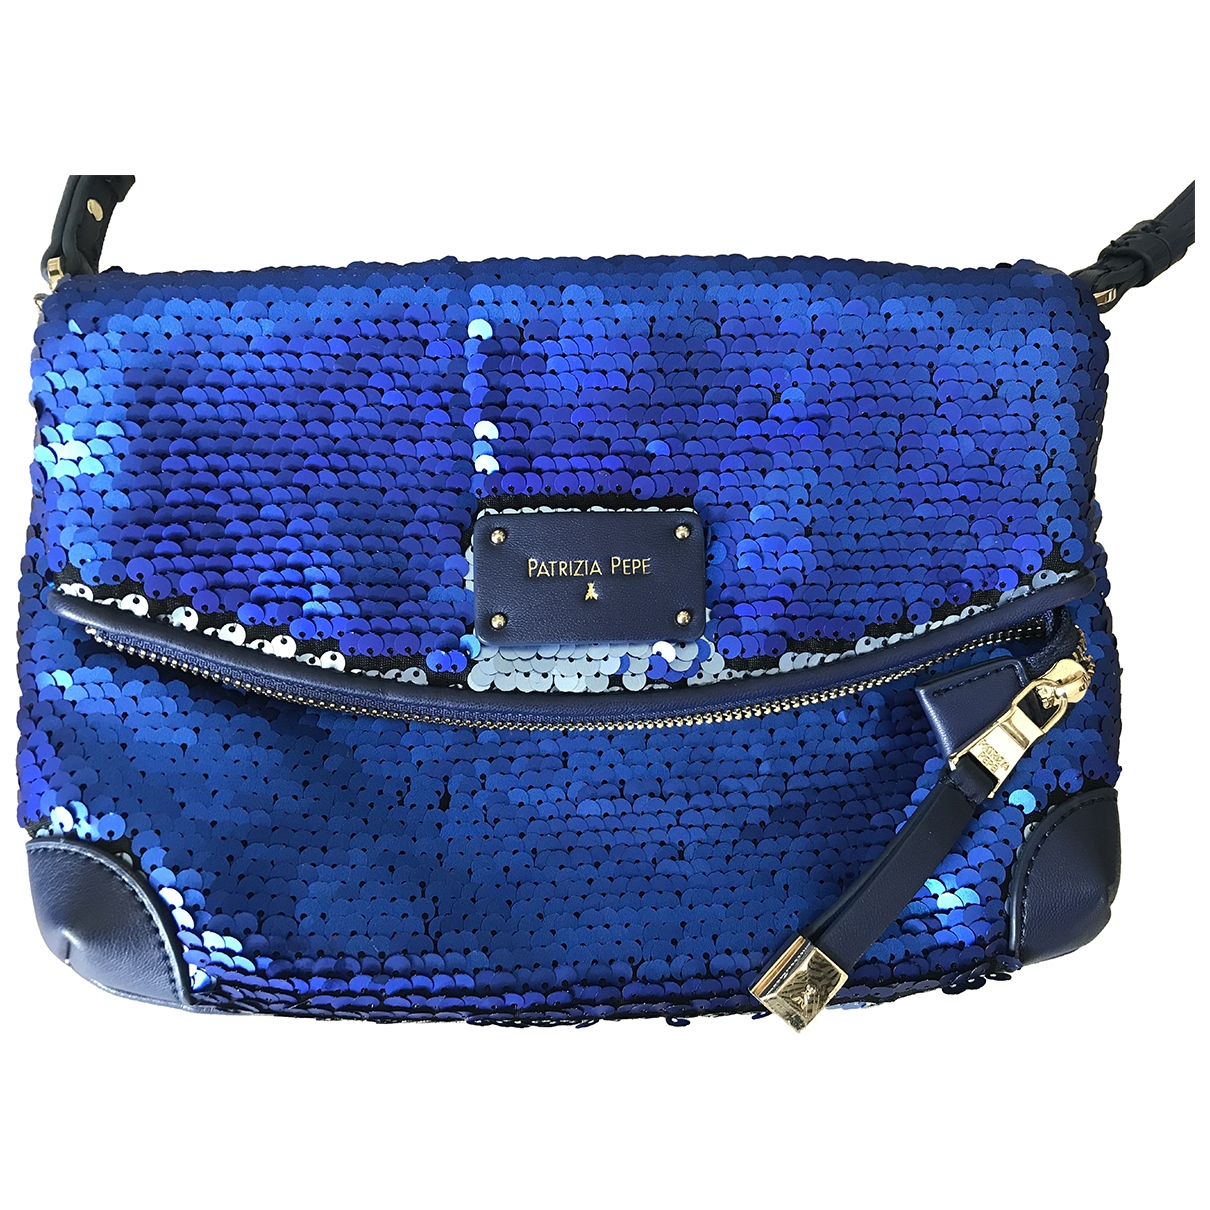 Patrizia Pepe \N Navy Leather handbag for Women \N